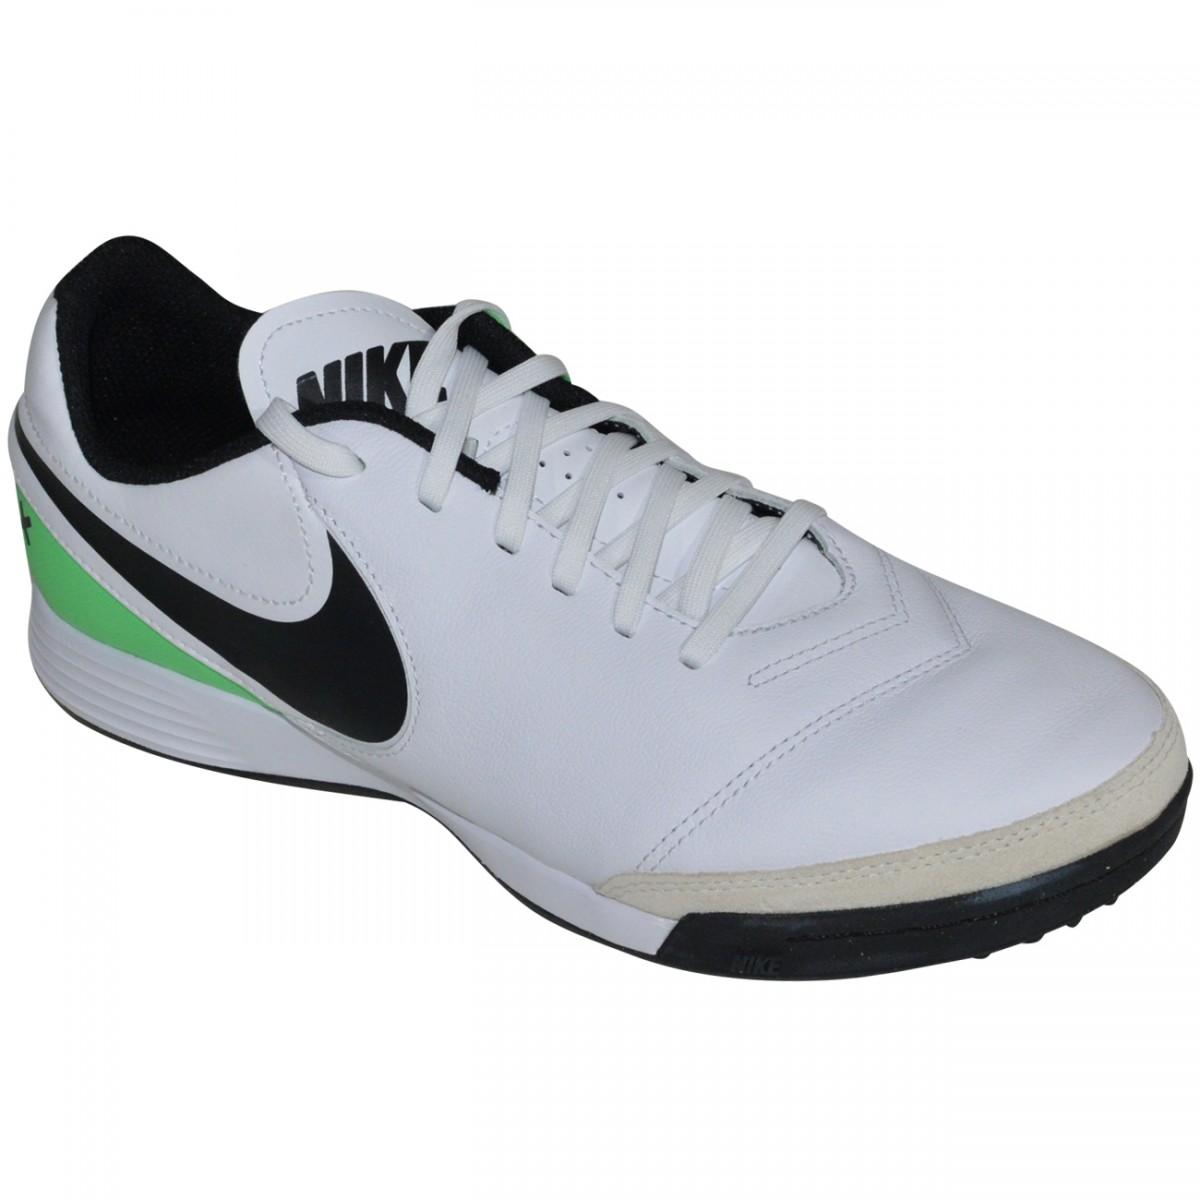 8f77b81ed5 Chuteira Society Nike Tiempox Genio II Leather 819216 103 - Branco Preto Verde  - Chuteira Nike